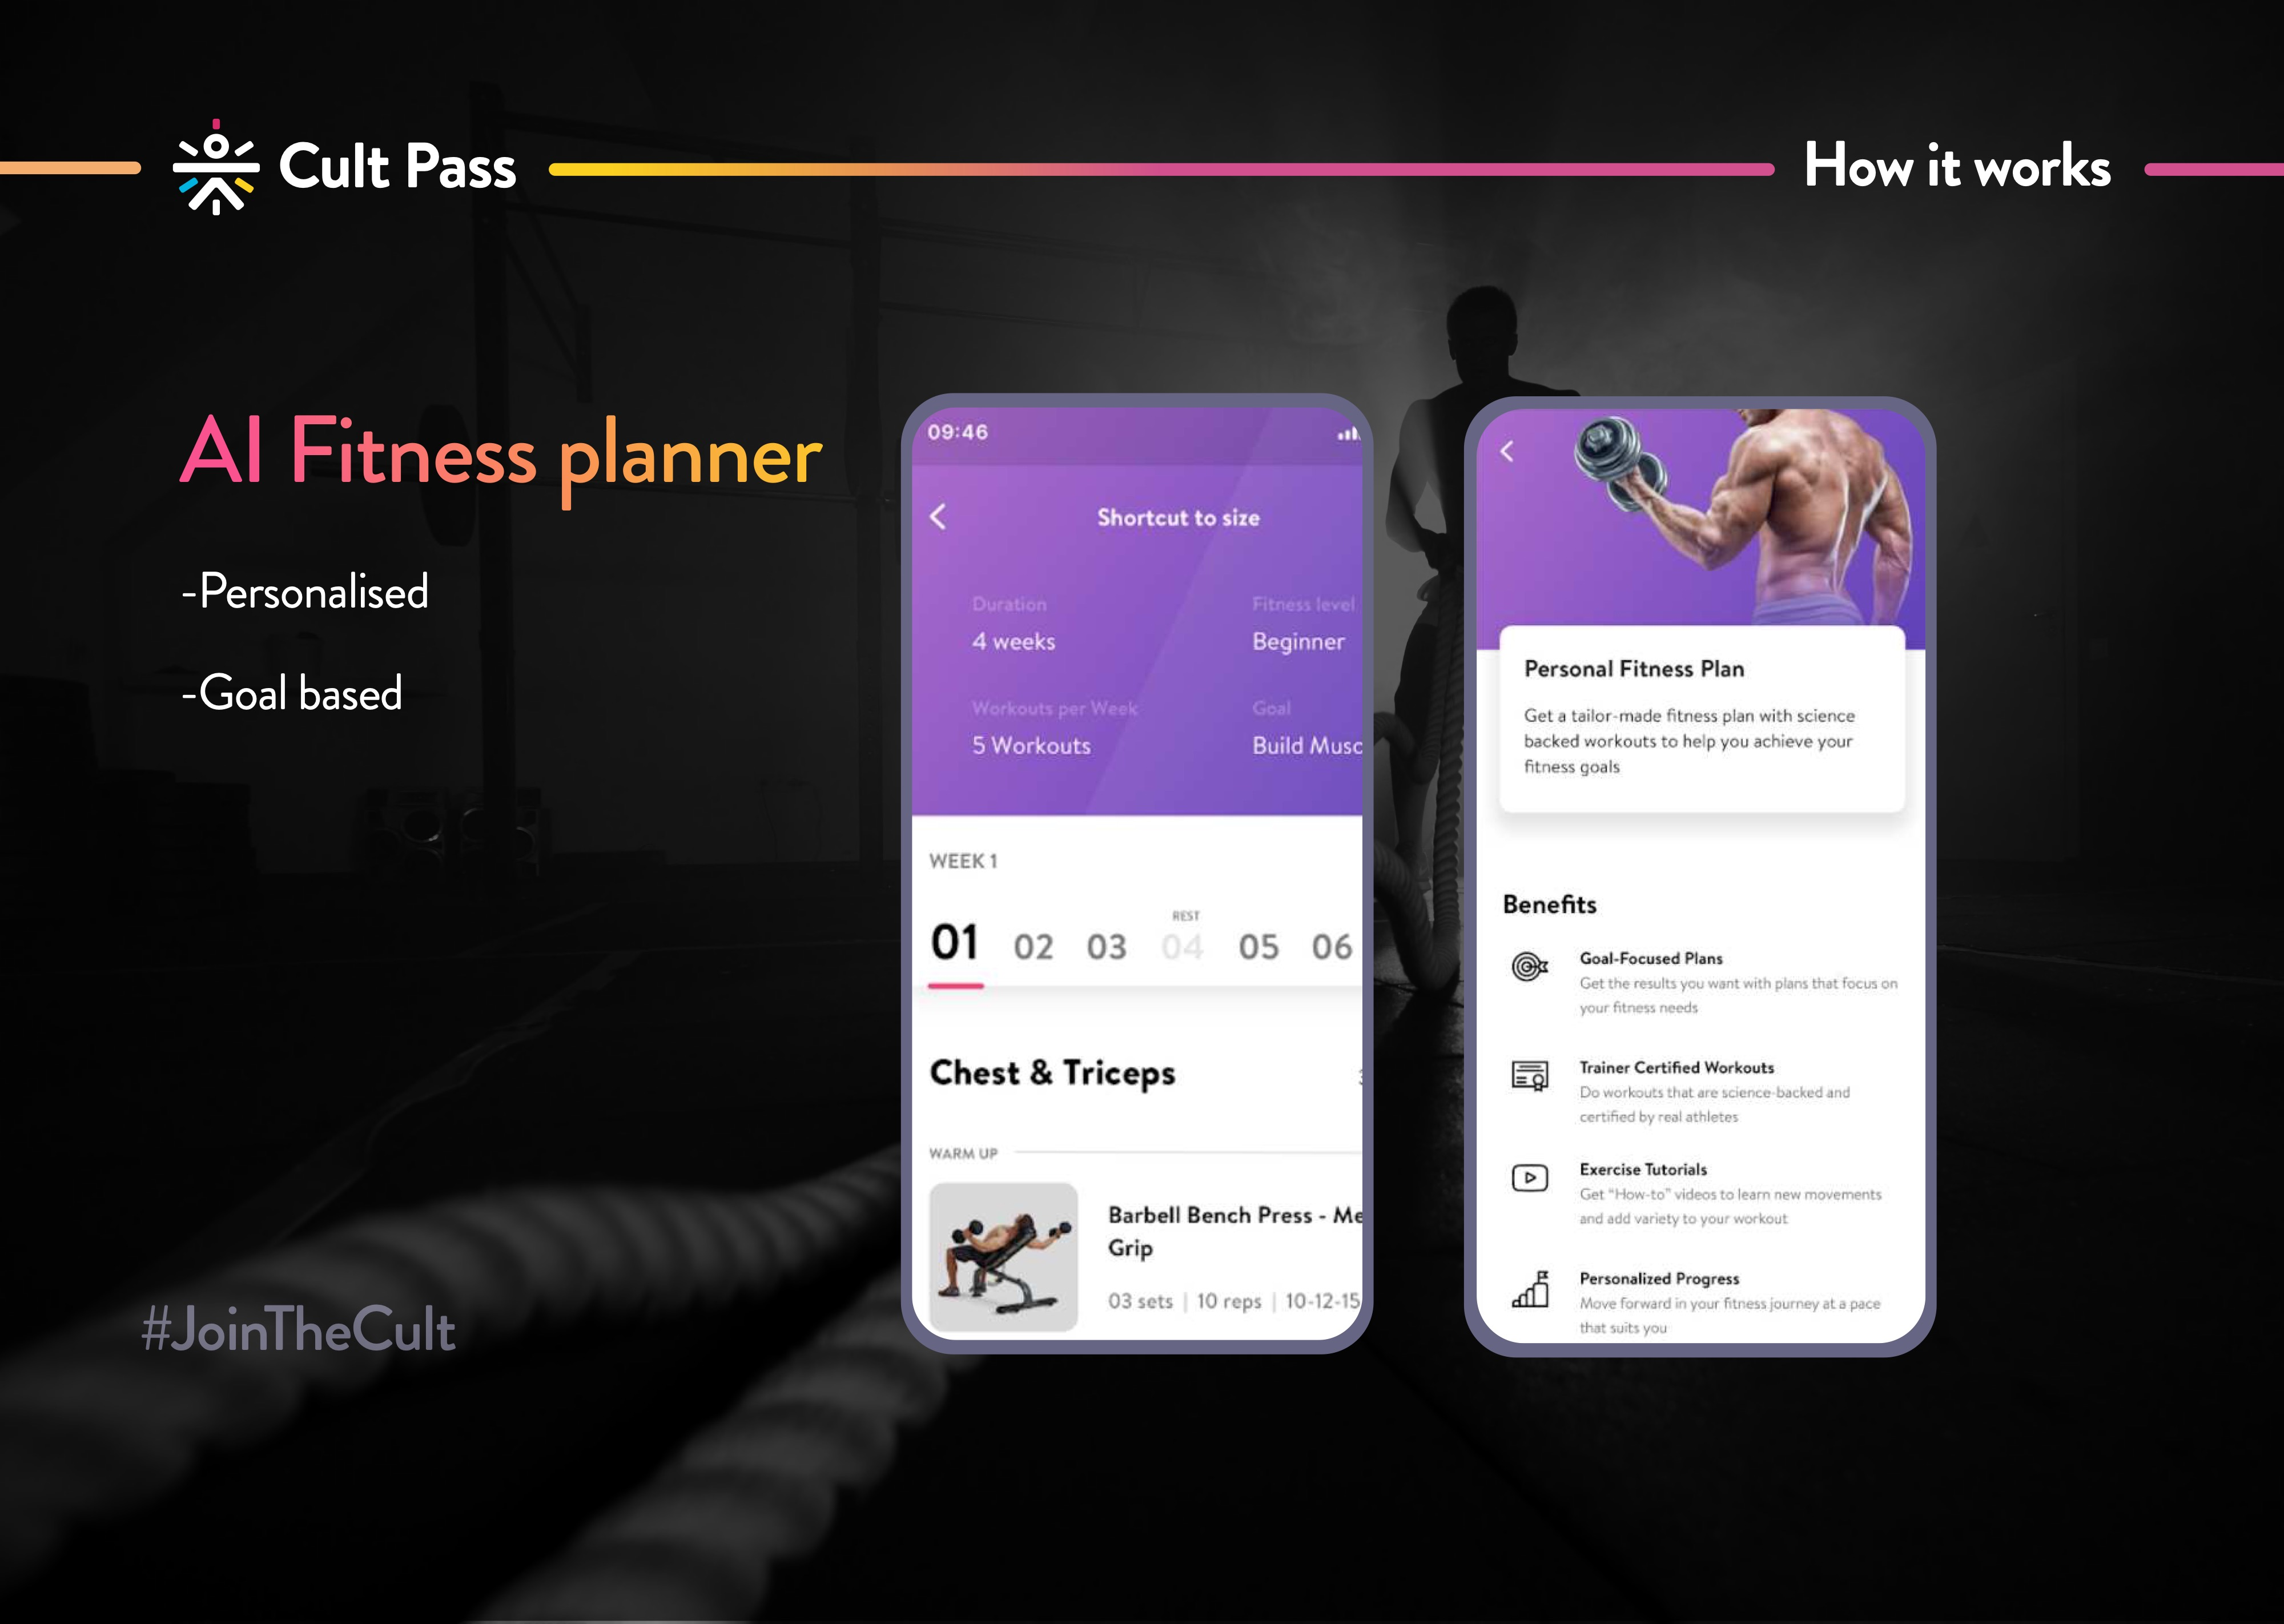 cult pass app screens